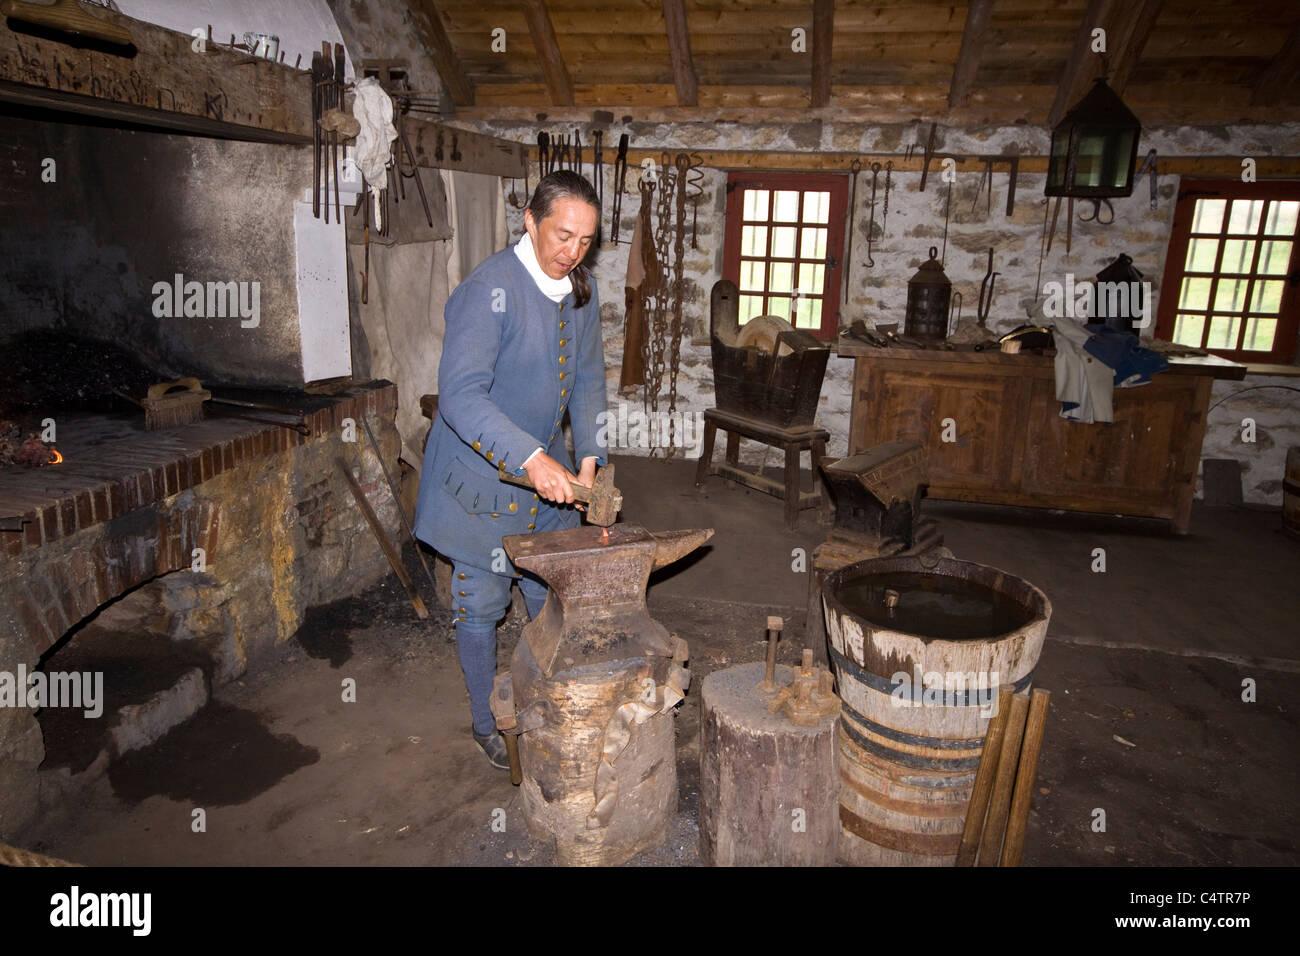 Period actor demonstrates blacksmith skills at Fortress of Louisbourg National Historic Site, Cape Breton, Nova - Stock Image